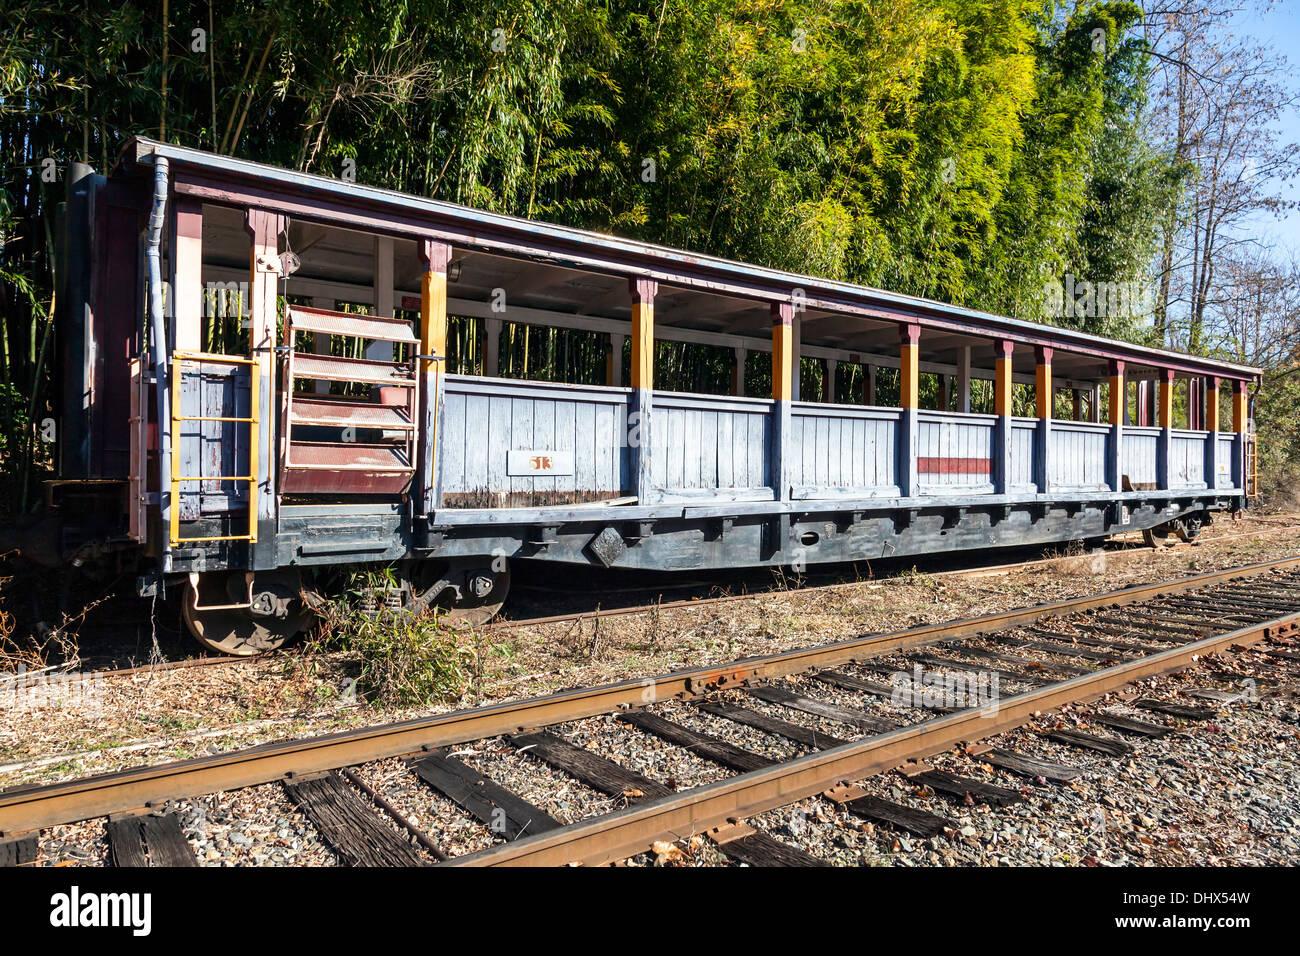 Open passenger railroad car used for Smoky Mountain tours on side spur near Dillsboro and Sylva, North Carolina, USA. - Stock Image